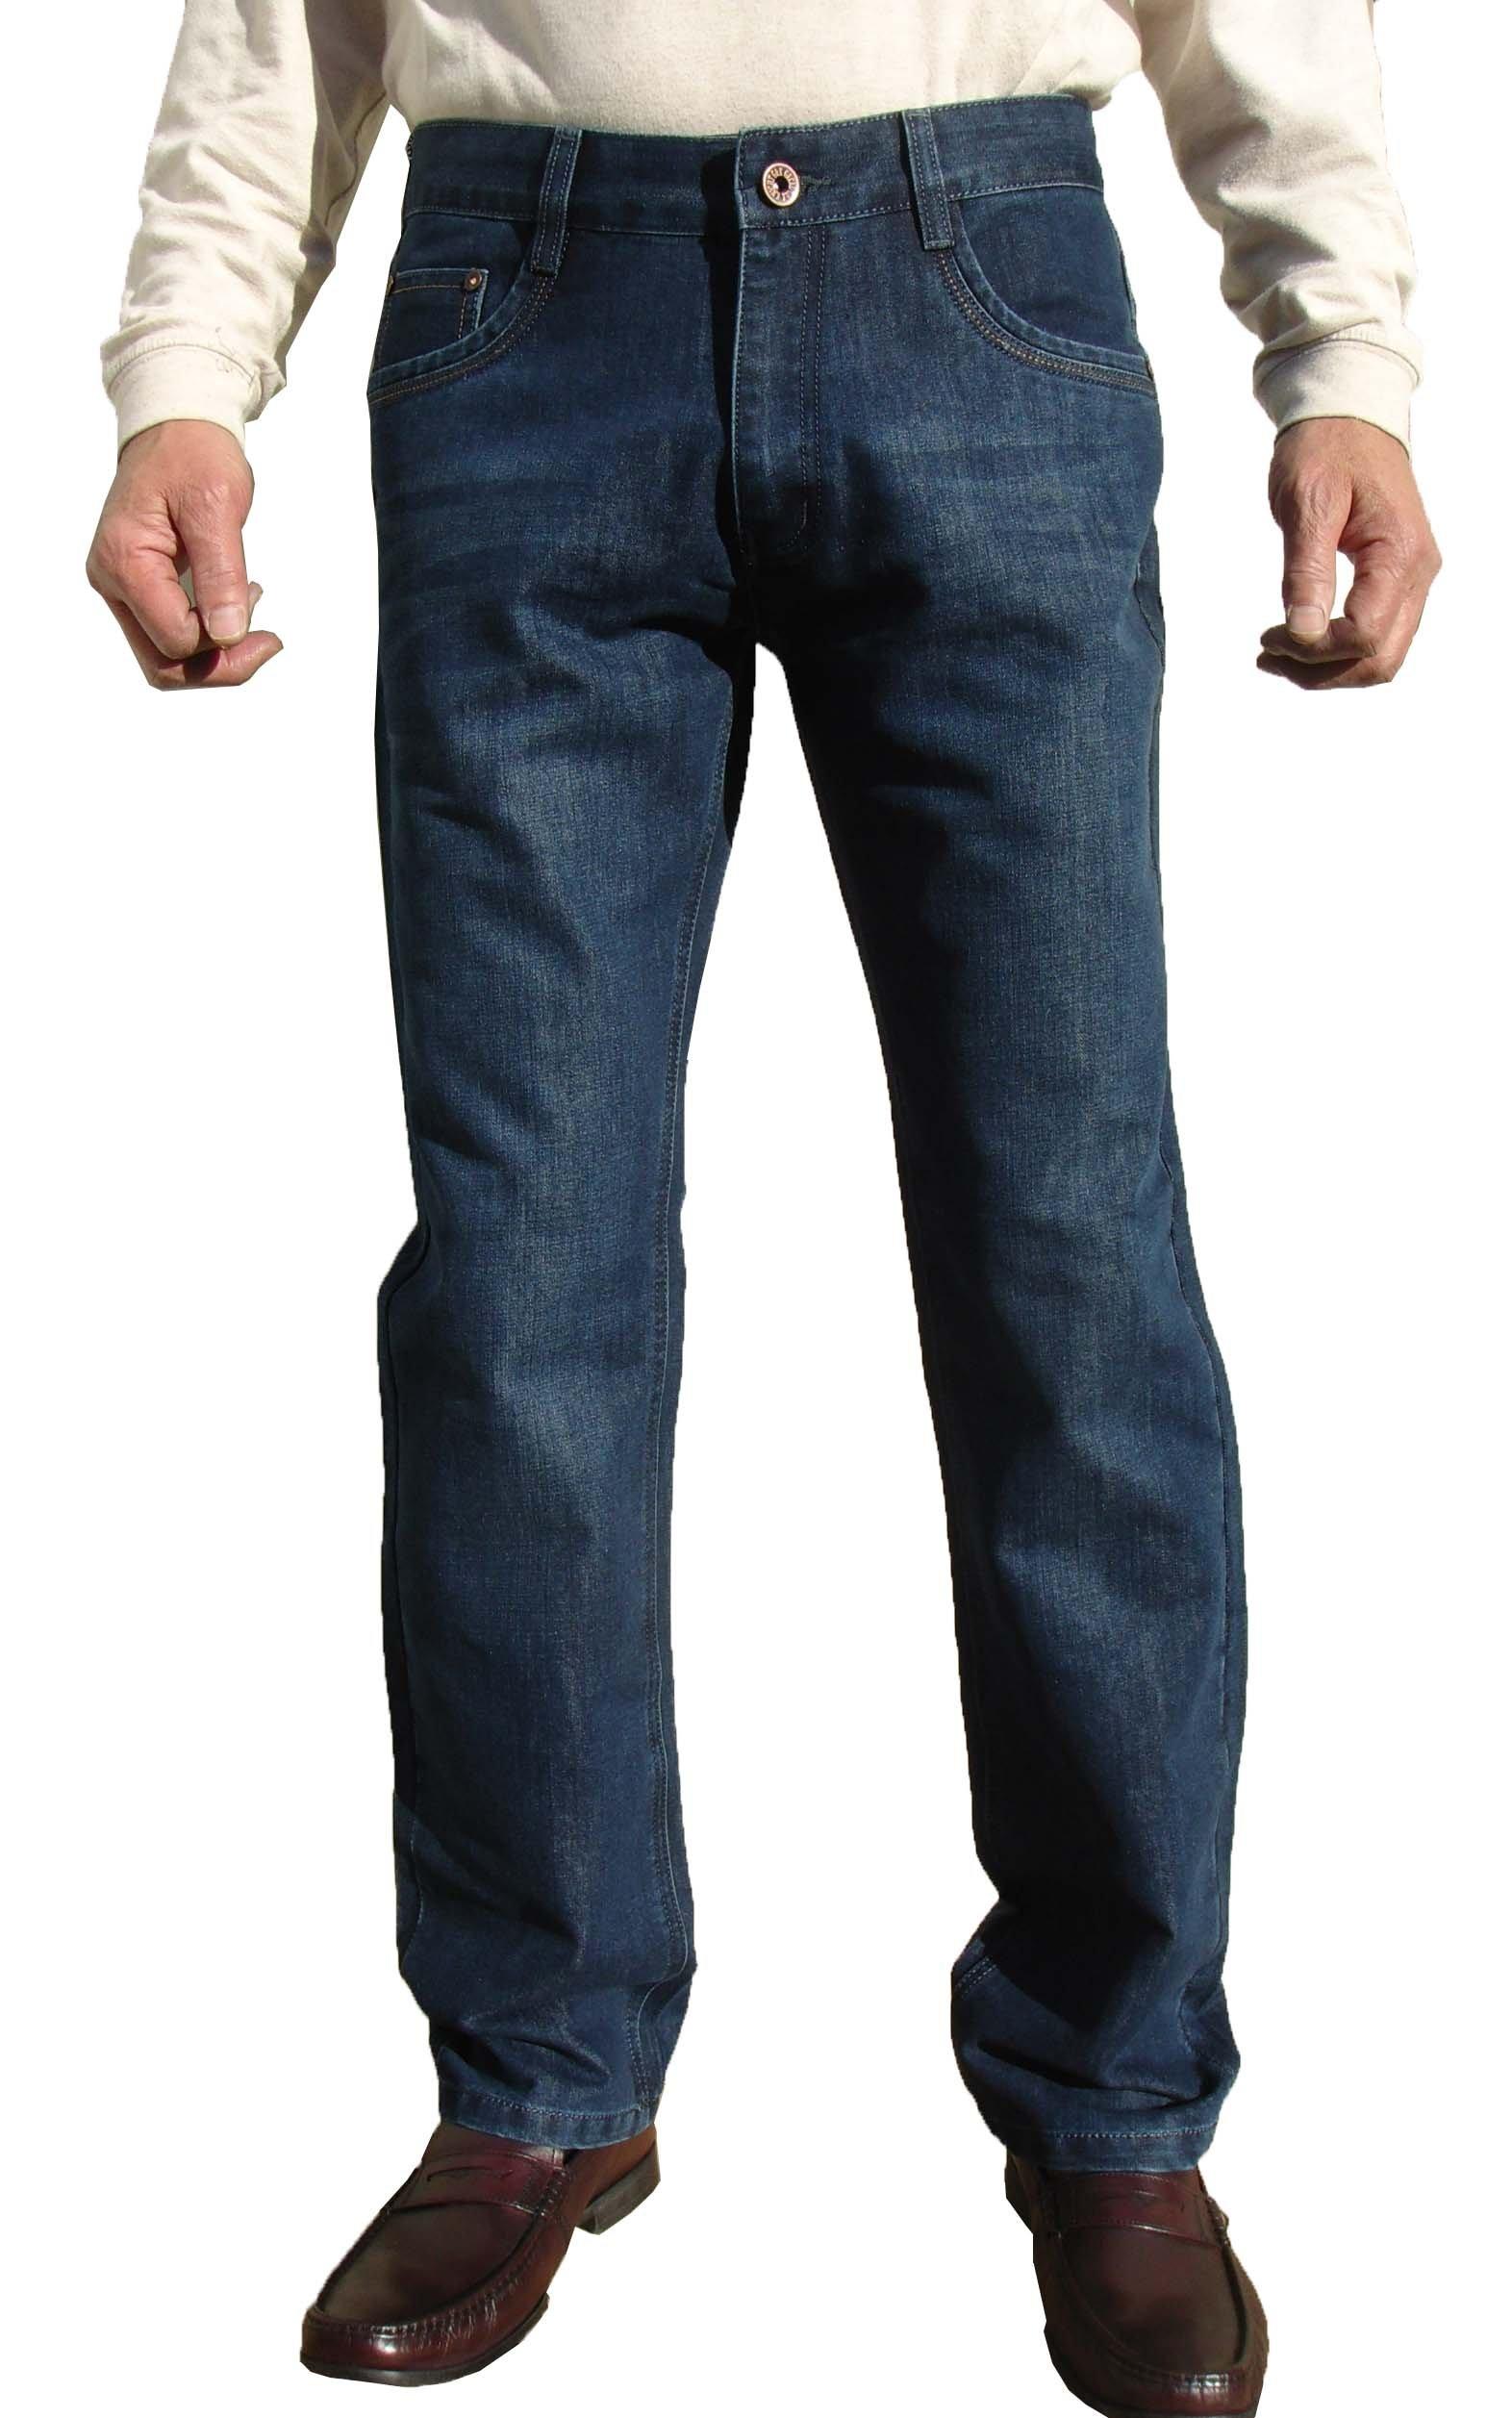 Men's straight Fit light Blue Color Washed Casual Jean Pants #1524-sdbu-40L